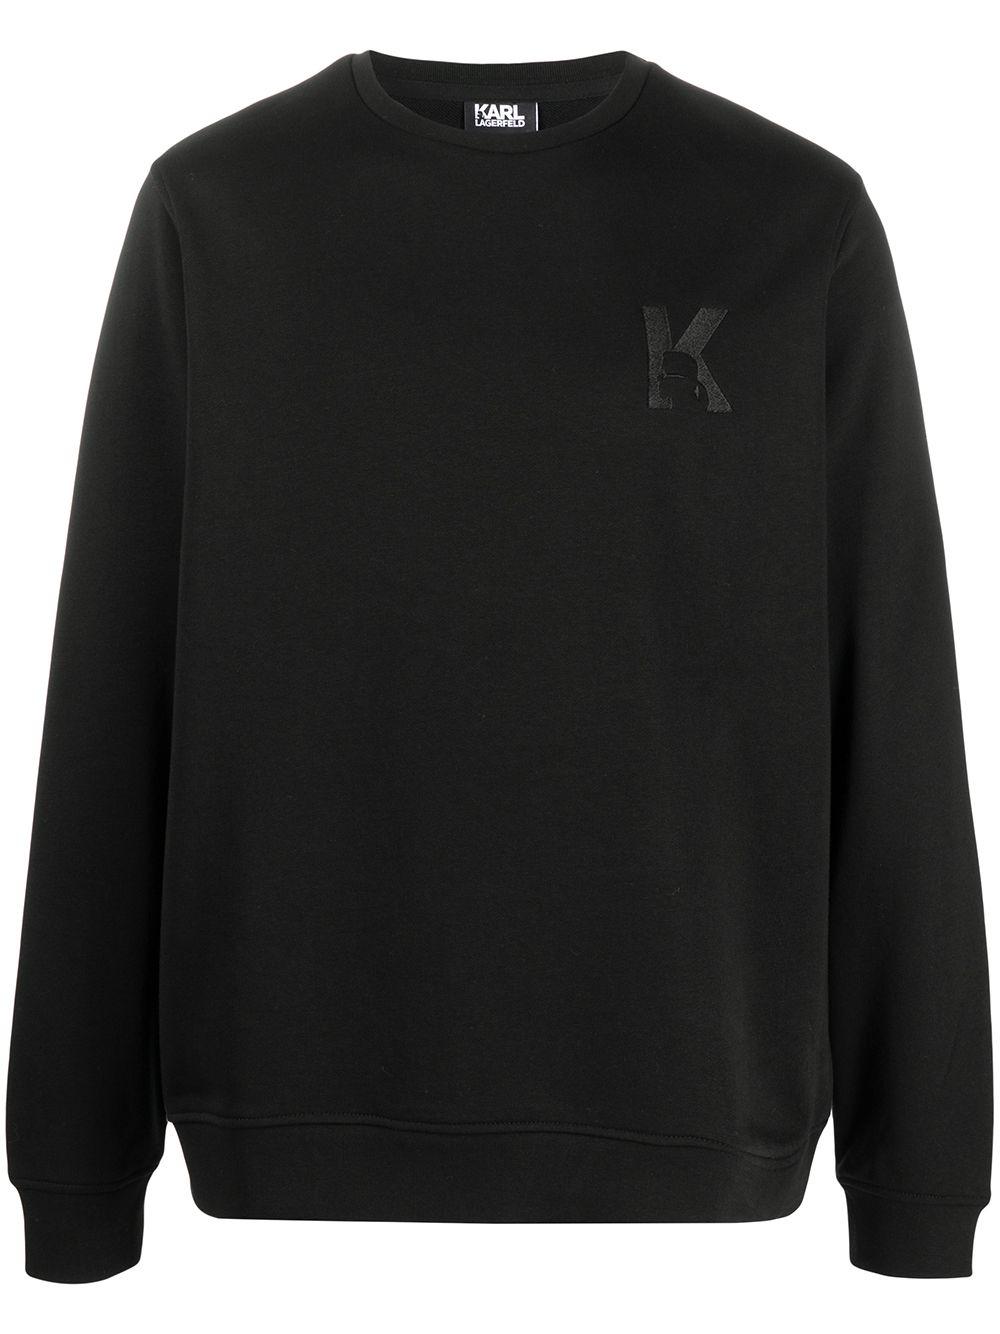 Karl Lagerfeld K embroidery rib-trimmed sweatshirt - Blau